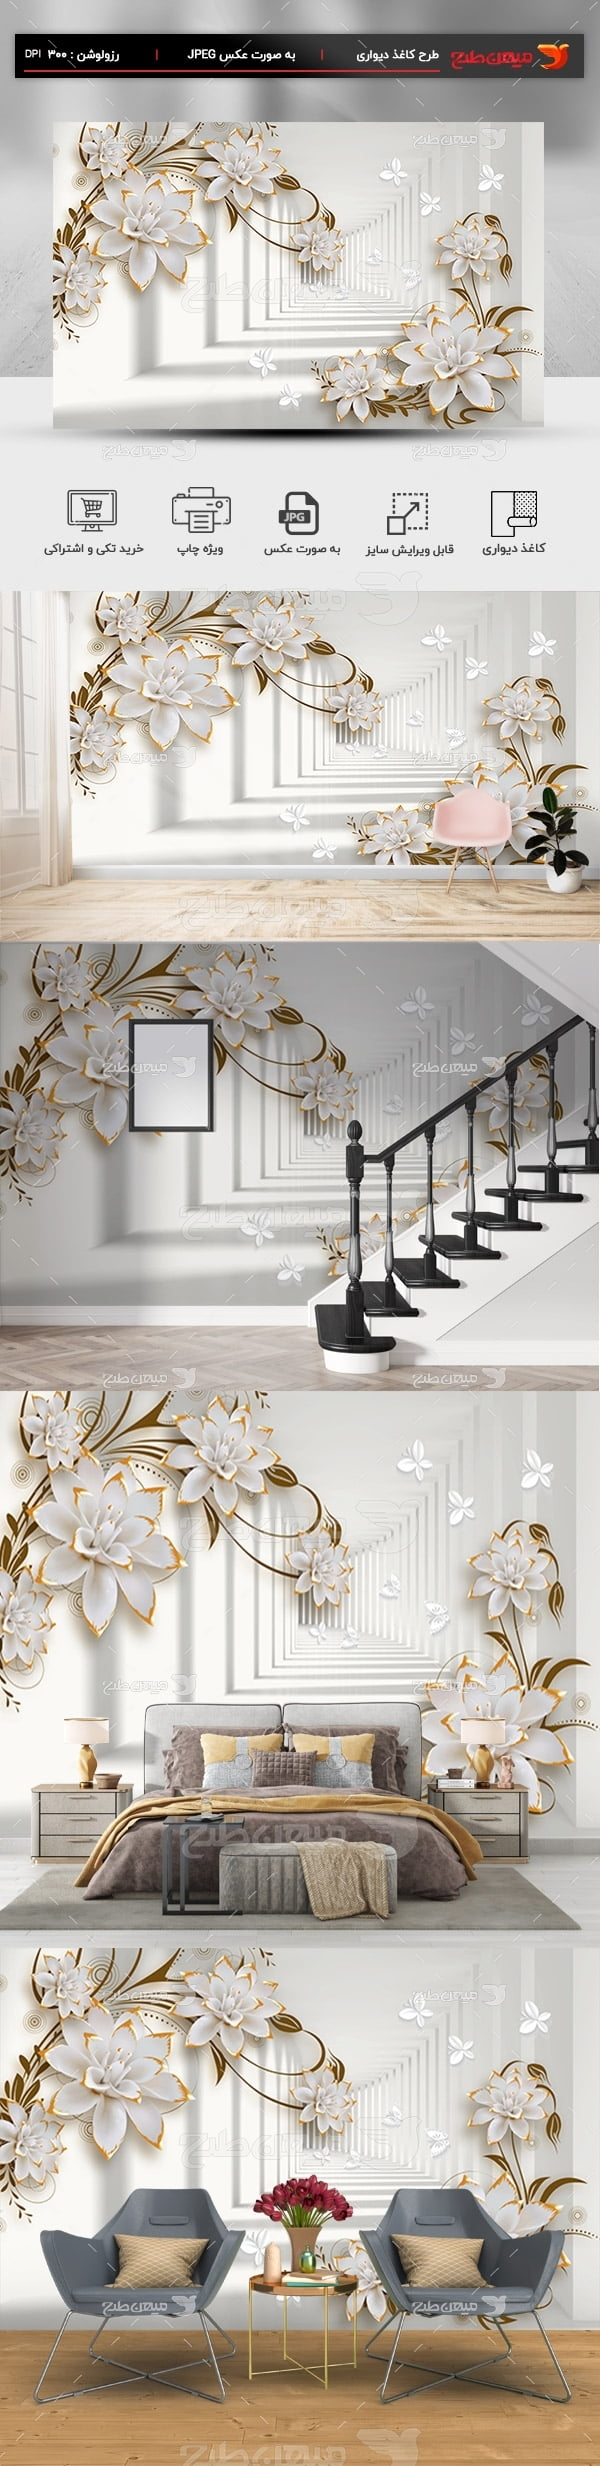 پوستر کاغذ دیواری سه بعدی طرح گل سفید طلایی